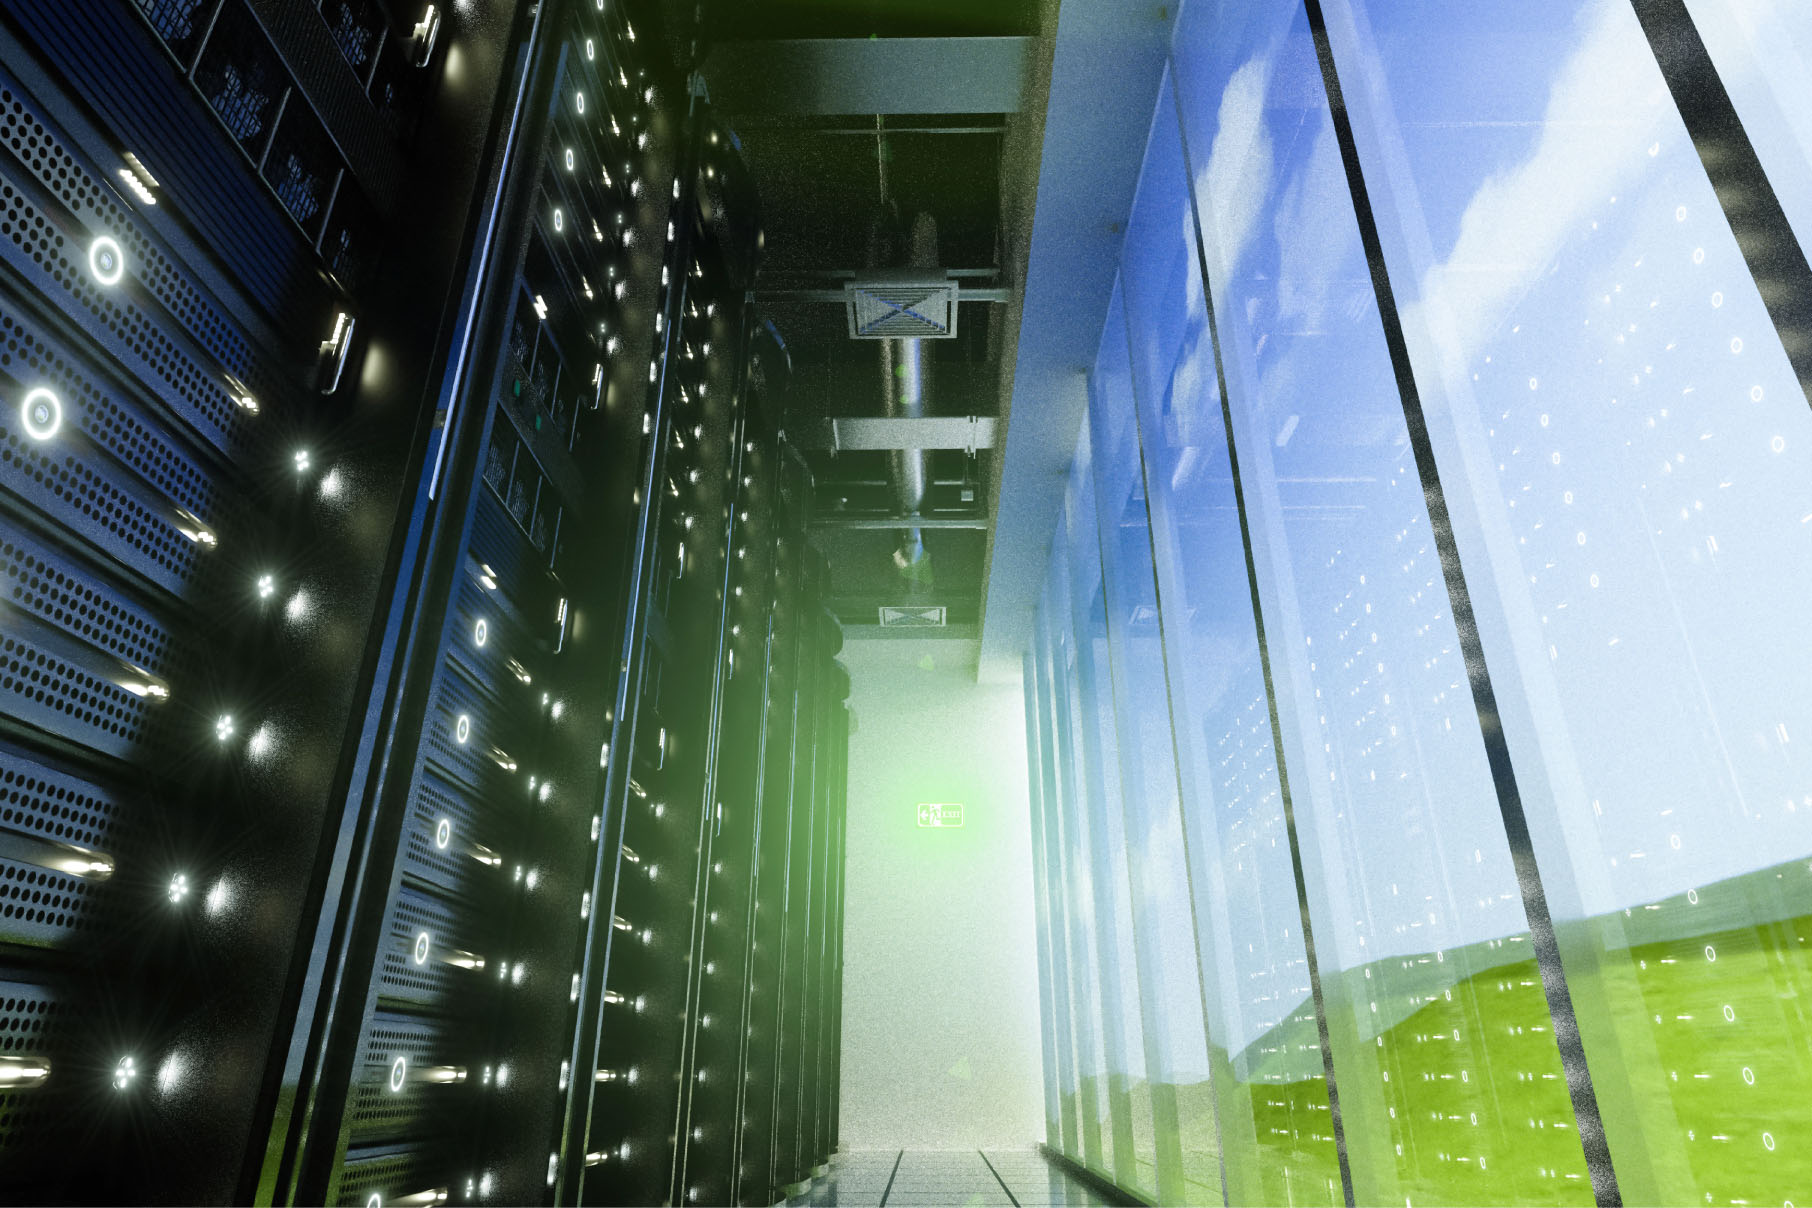 How to migrate Windows Server 2012 R2 Hyper-v to 2016